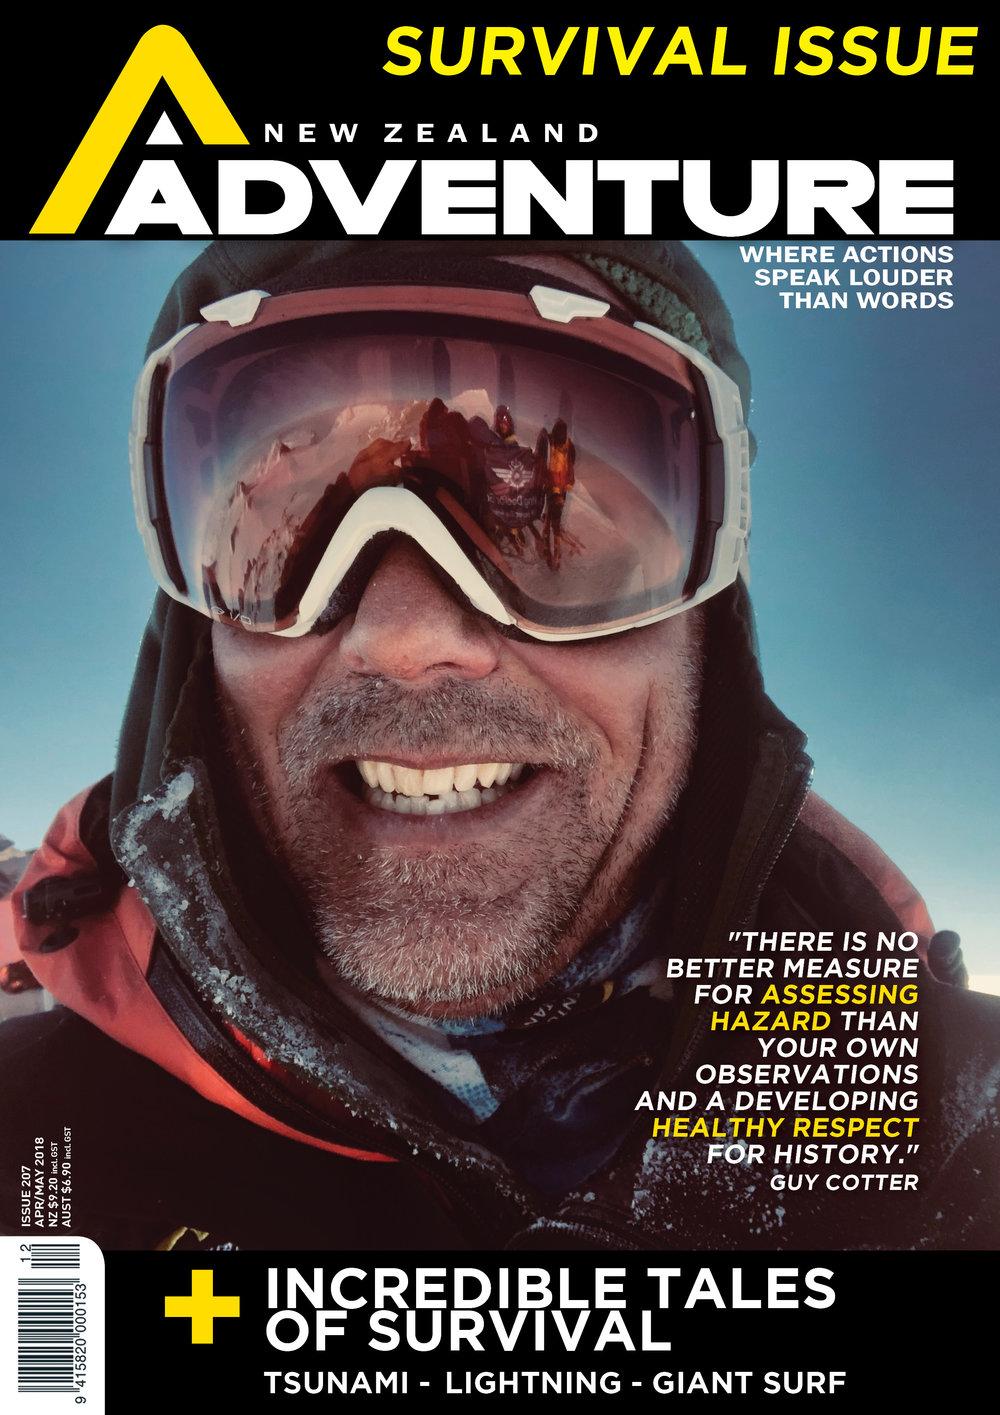 adventuremag cover.jpg